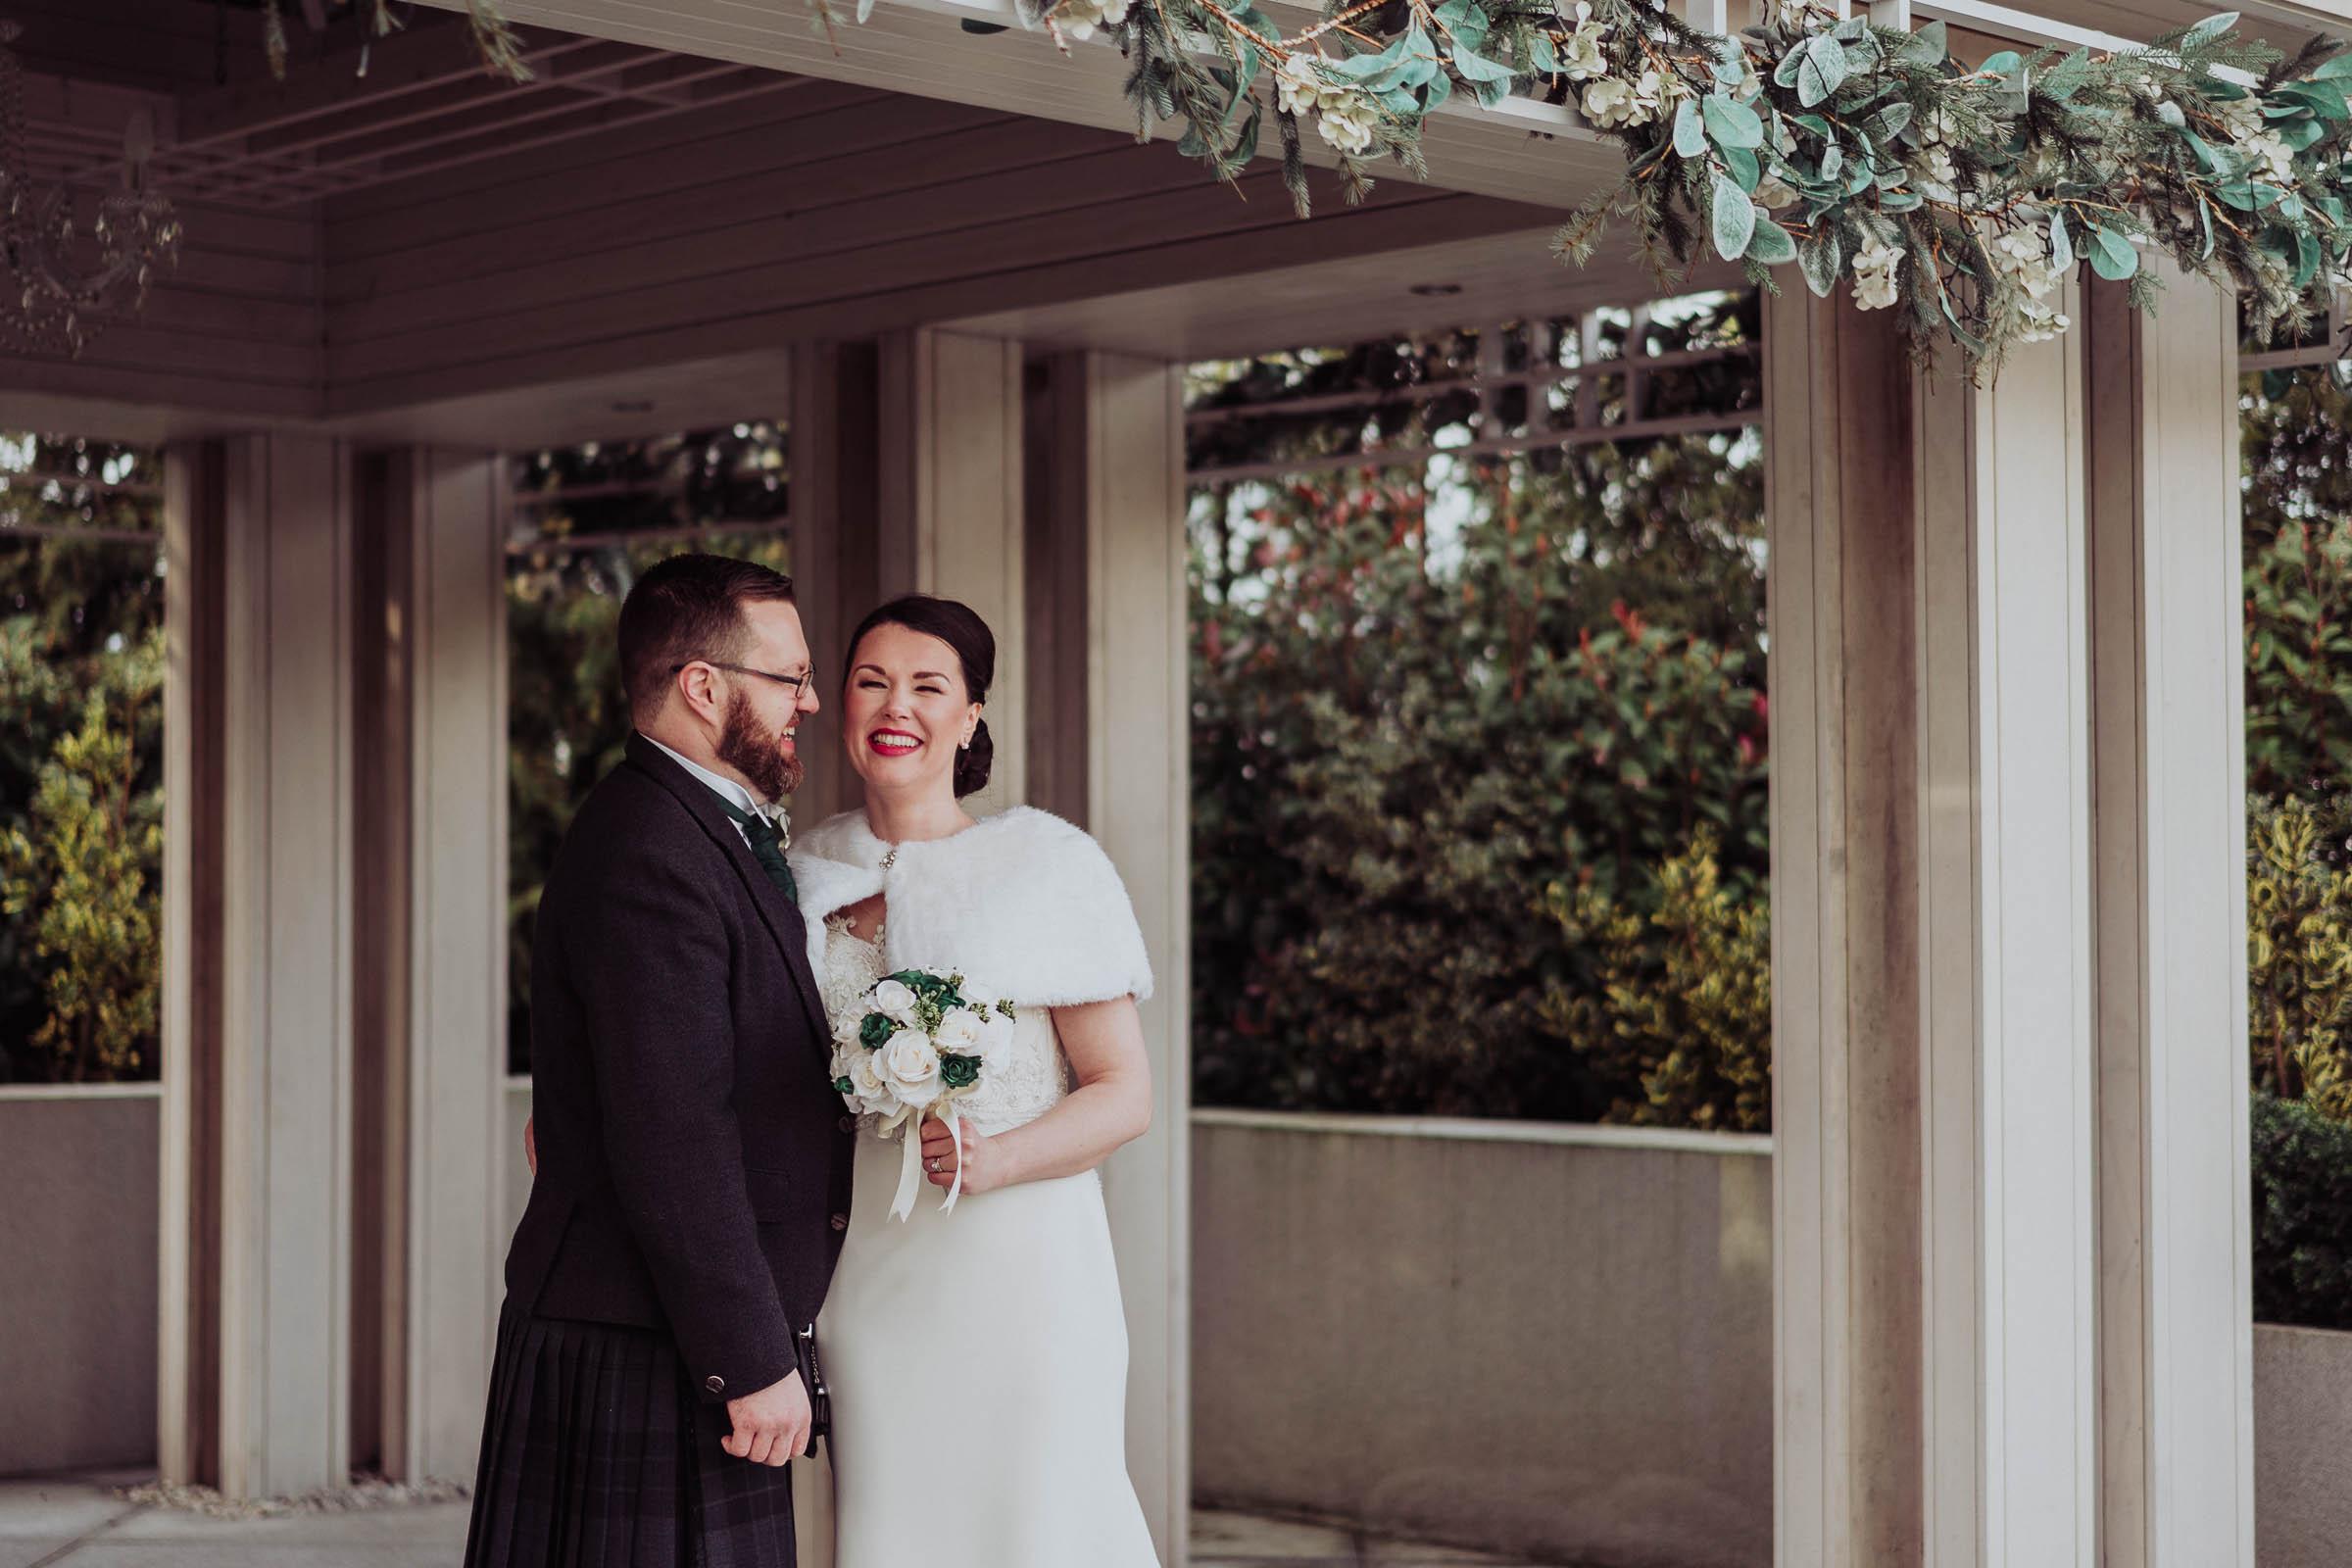 Radstone-Wedding-photographer-glasgow (2 of 5).jpg